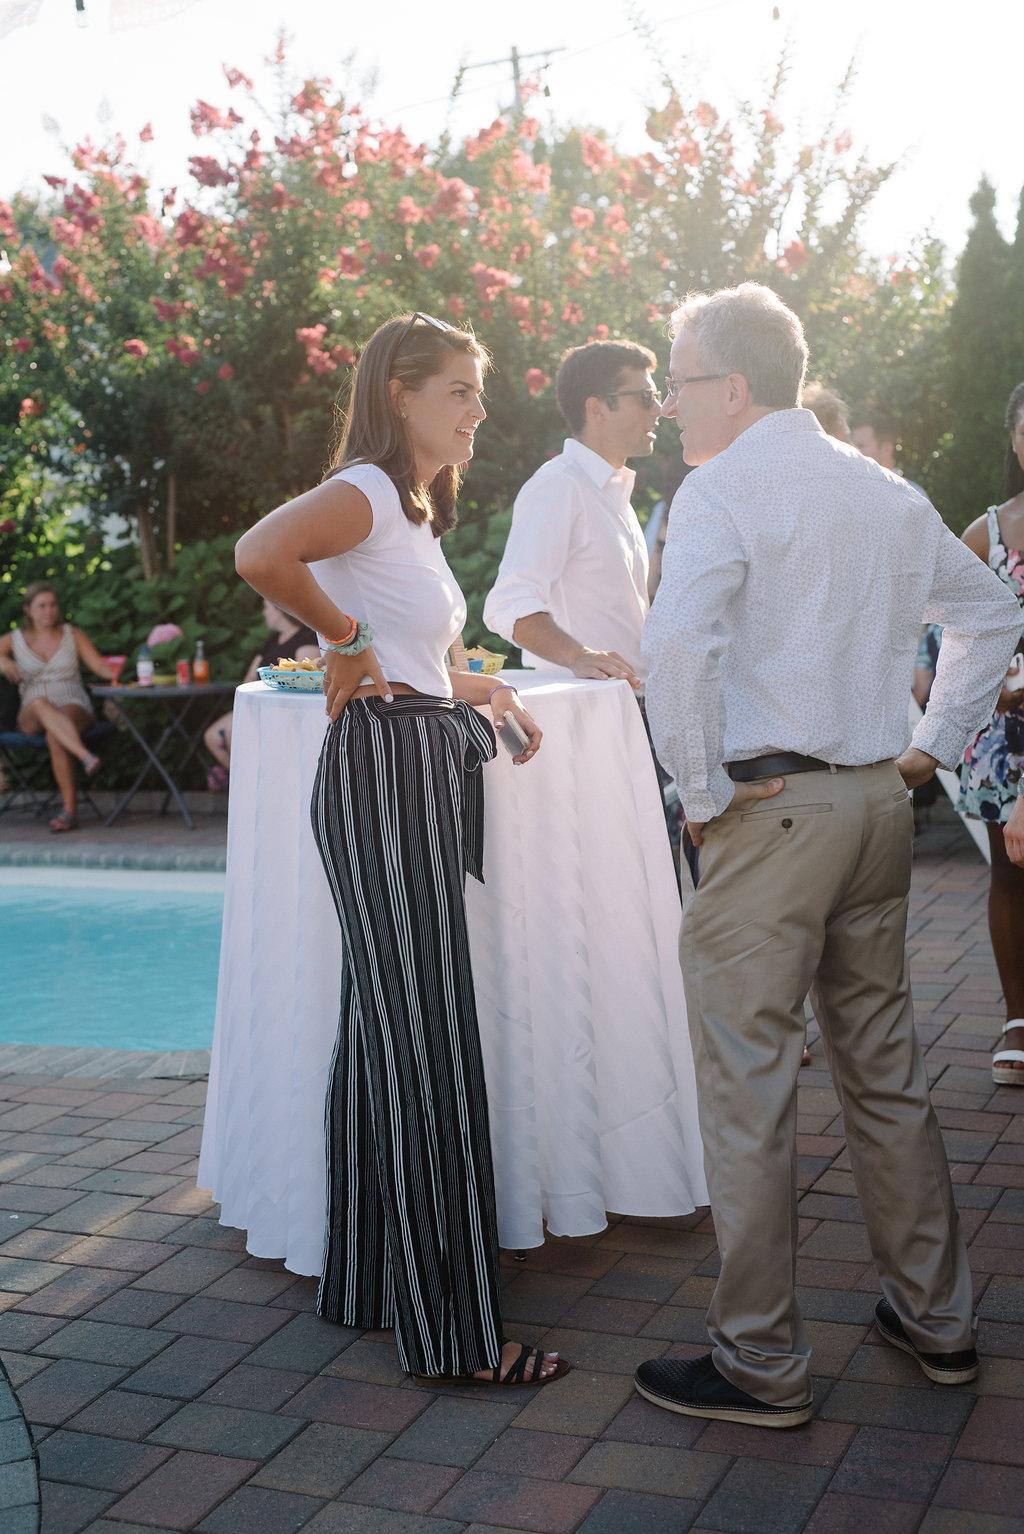 FiestaThemedEngagementParty-Nicole+Mike-SeaGirt-NewJersey-OliviaChristinaPhoto-52.jpg